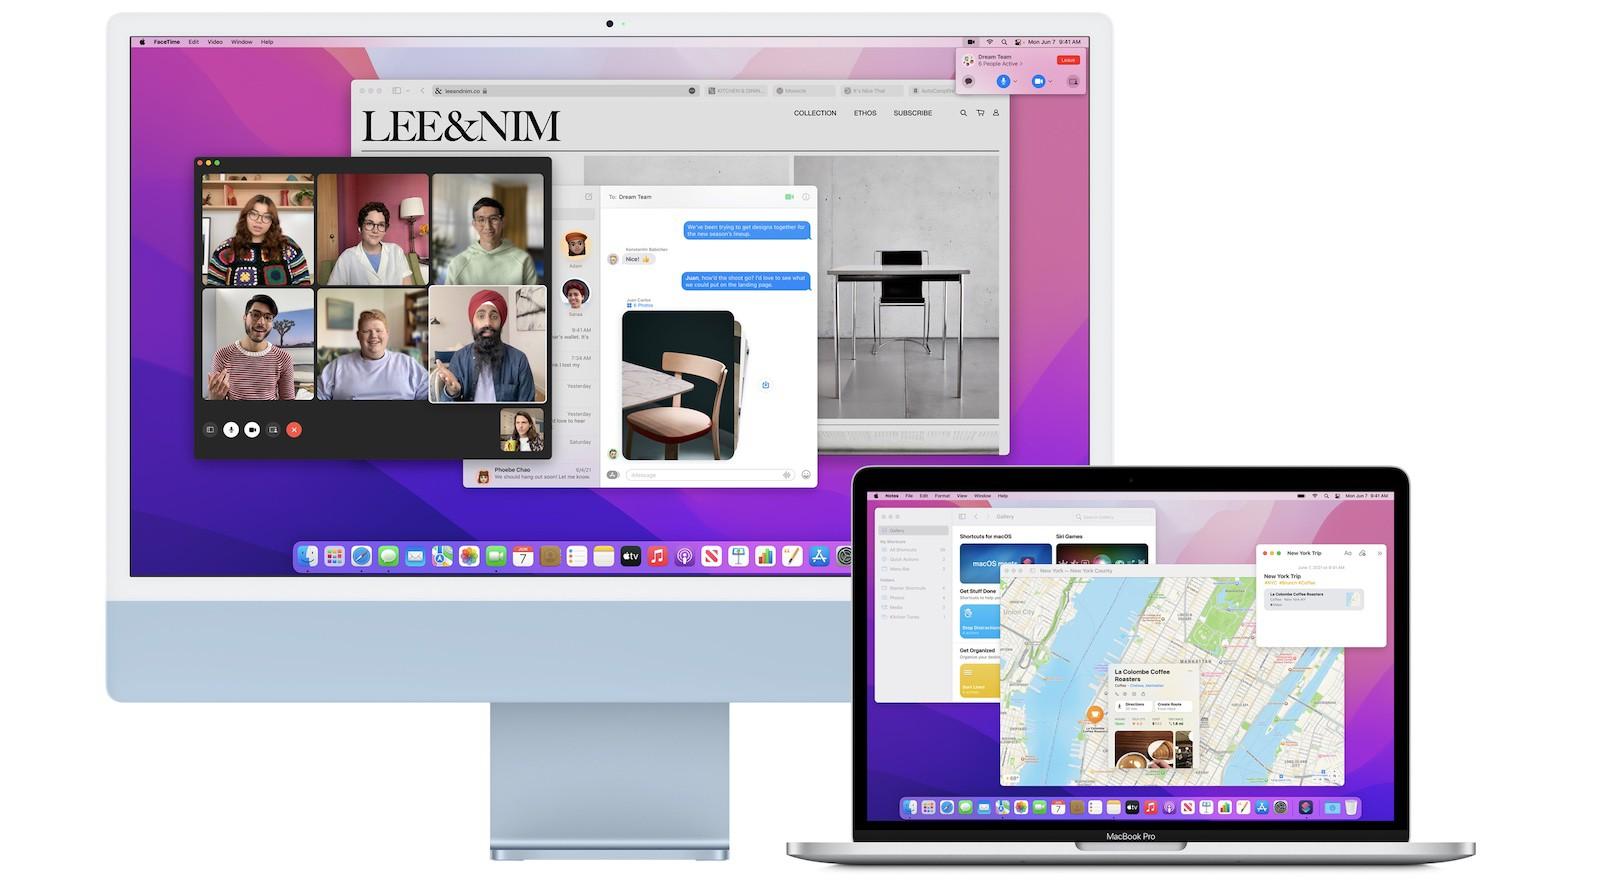 https://www.macfreak.nl/modules/news/images/zArt.24-inch-iMac2021MacBookPro-macOSMonterey.jpg